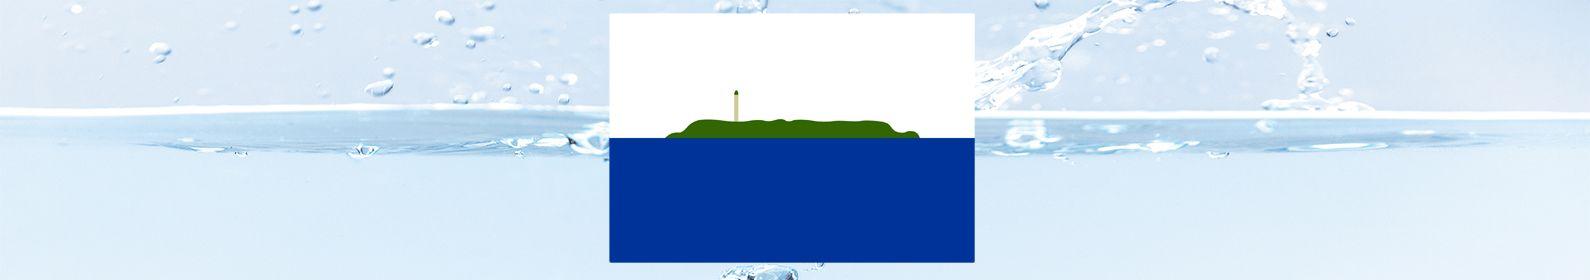 water-treatment-navassa-islands.jpg